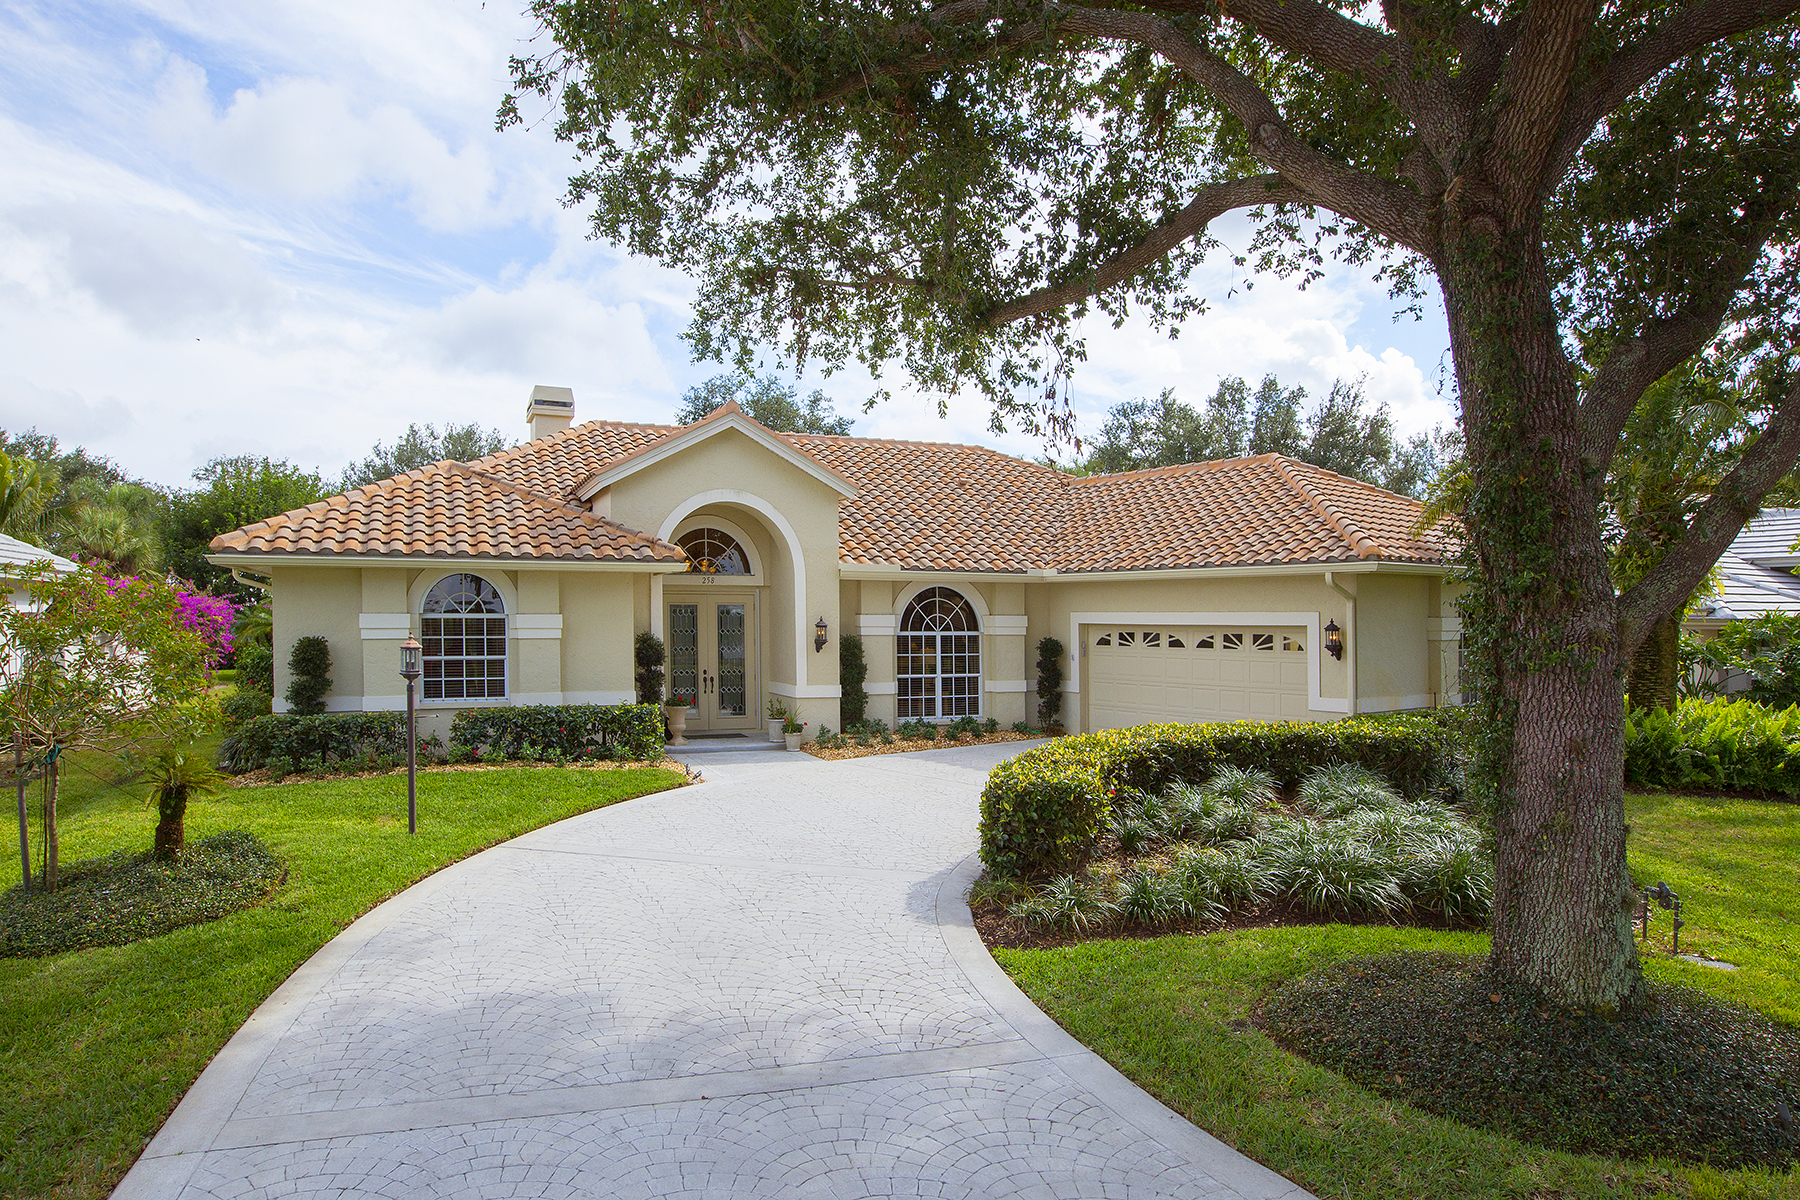 Single Family Home for Sale at Naples 258 Monterey Dr, Vineyards, Naples, Florida, 34119 United States